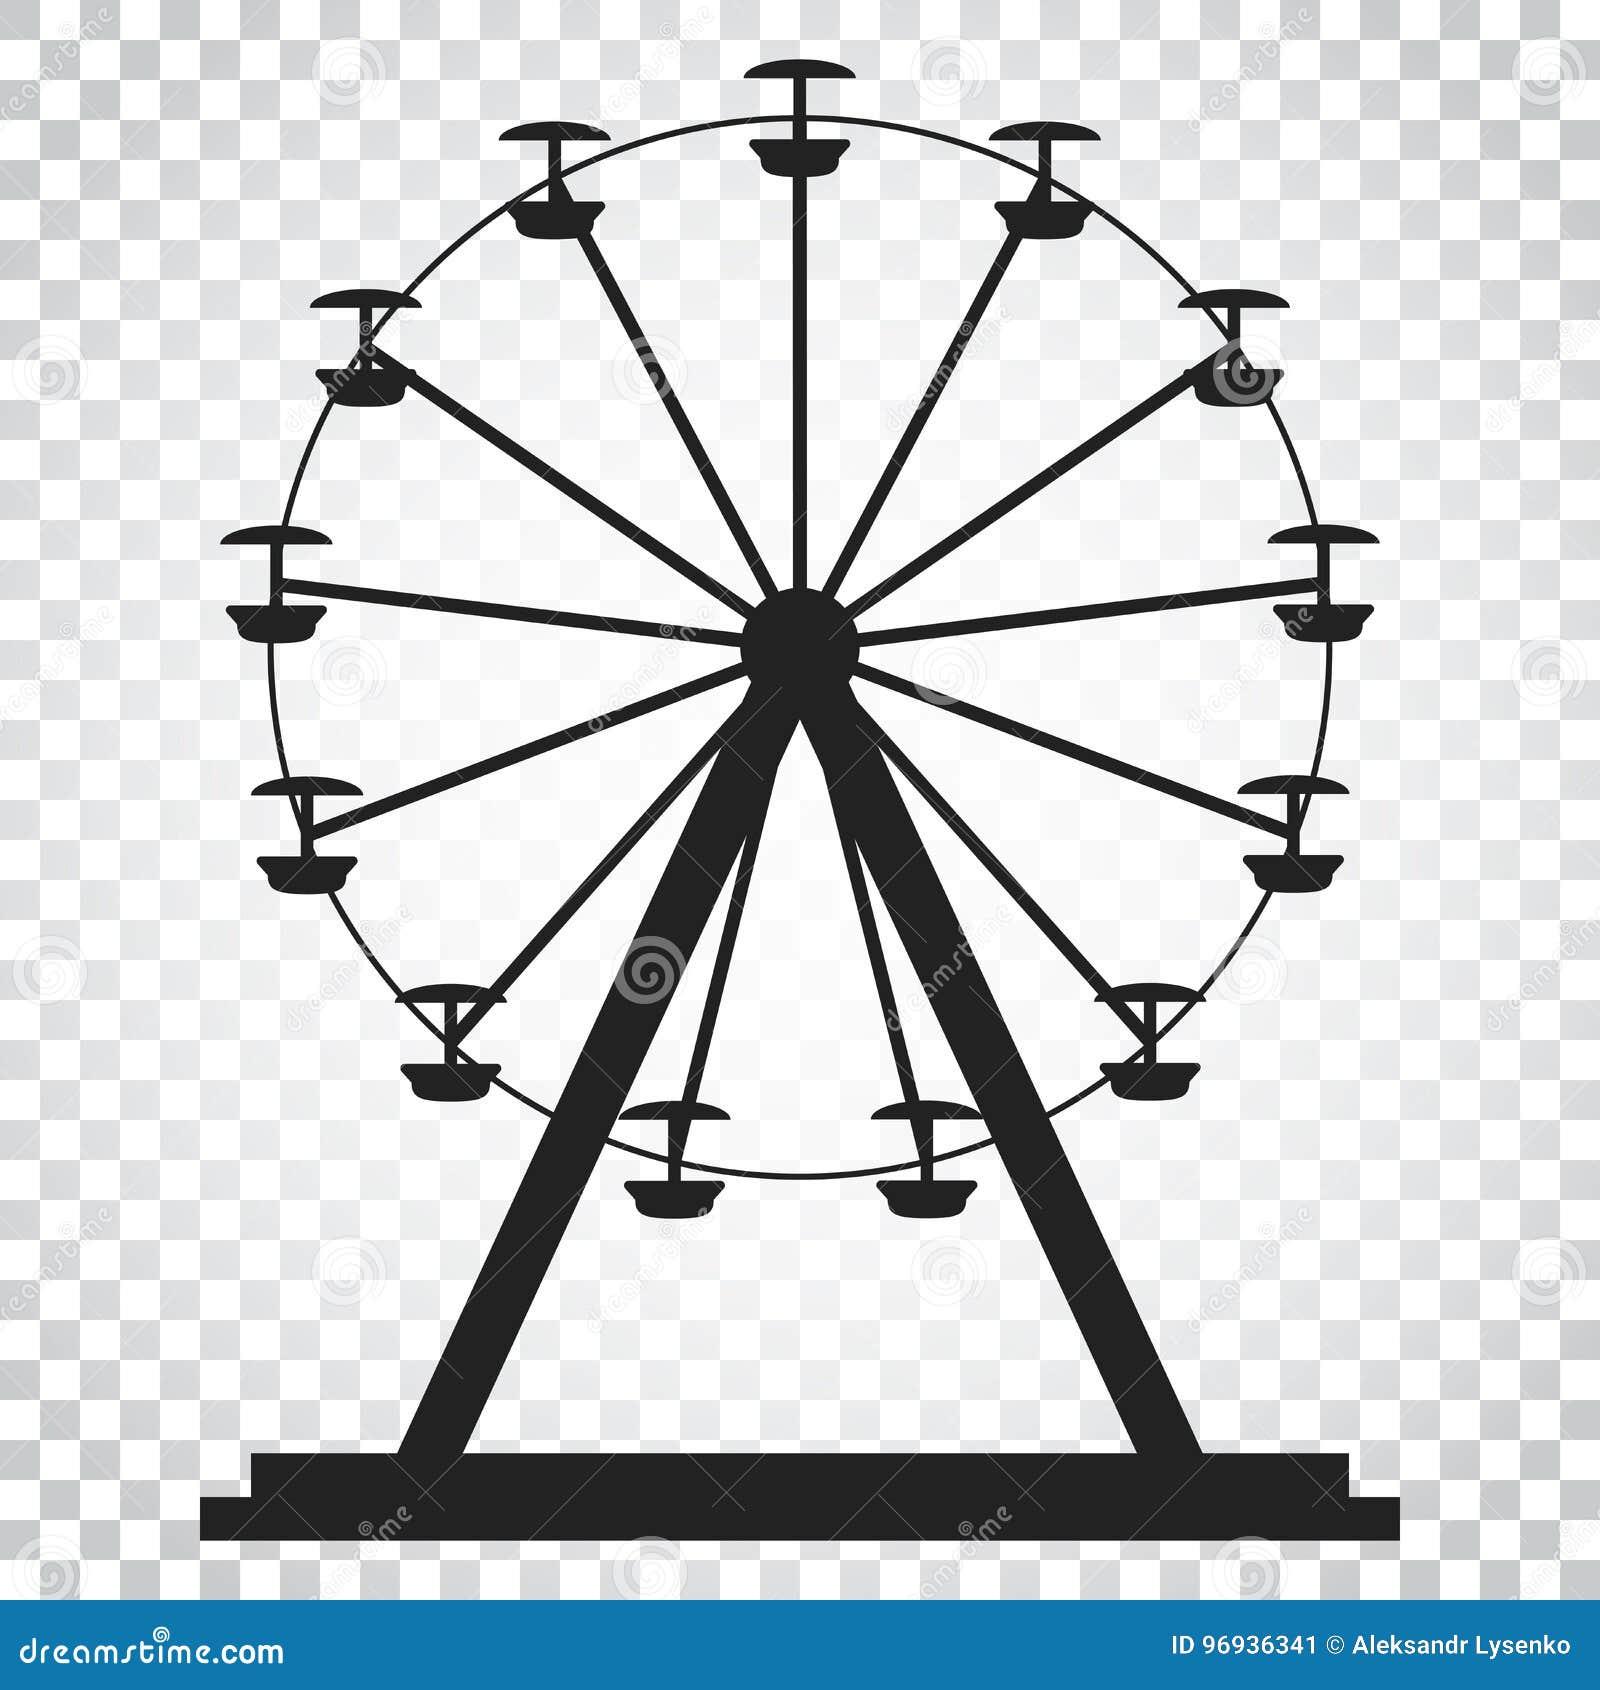 Ferris Wheel Vector Icon Carousel In Park Icon Amusement Ride Stock Vector Illustration Of Carousel Funfair 96936341